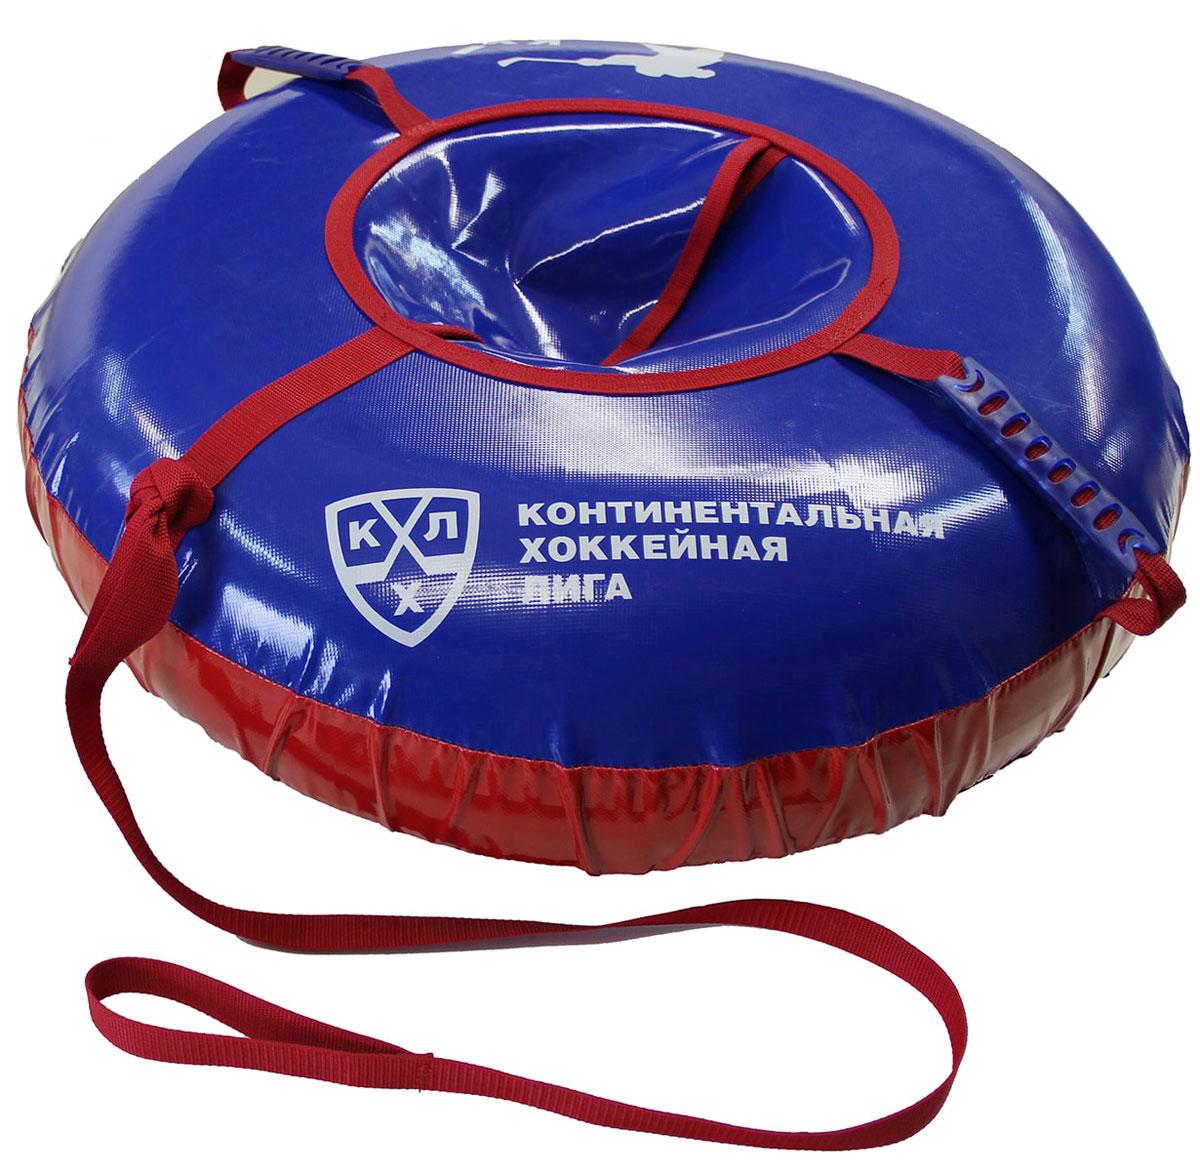 Сноутьюб КХЛ  Тент-тент , с камерой, 100 x 100 x 40 см - Санки и снегокаты